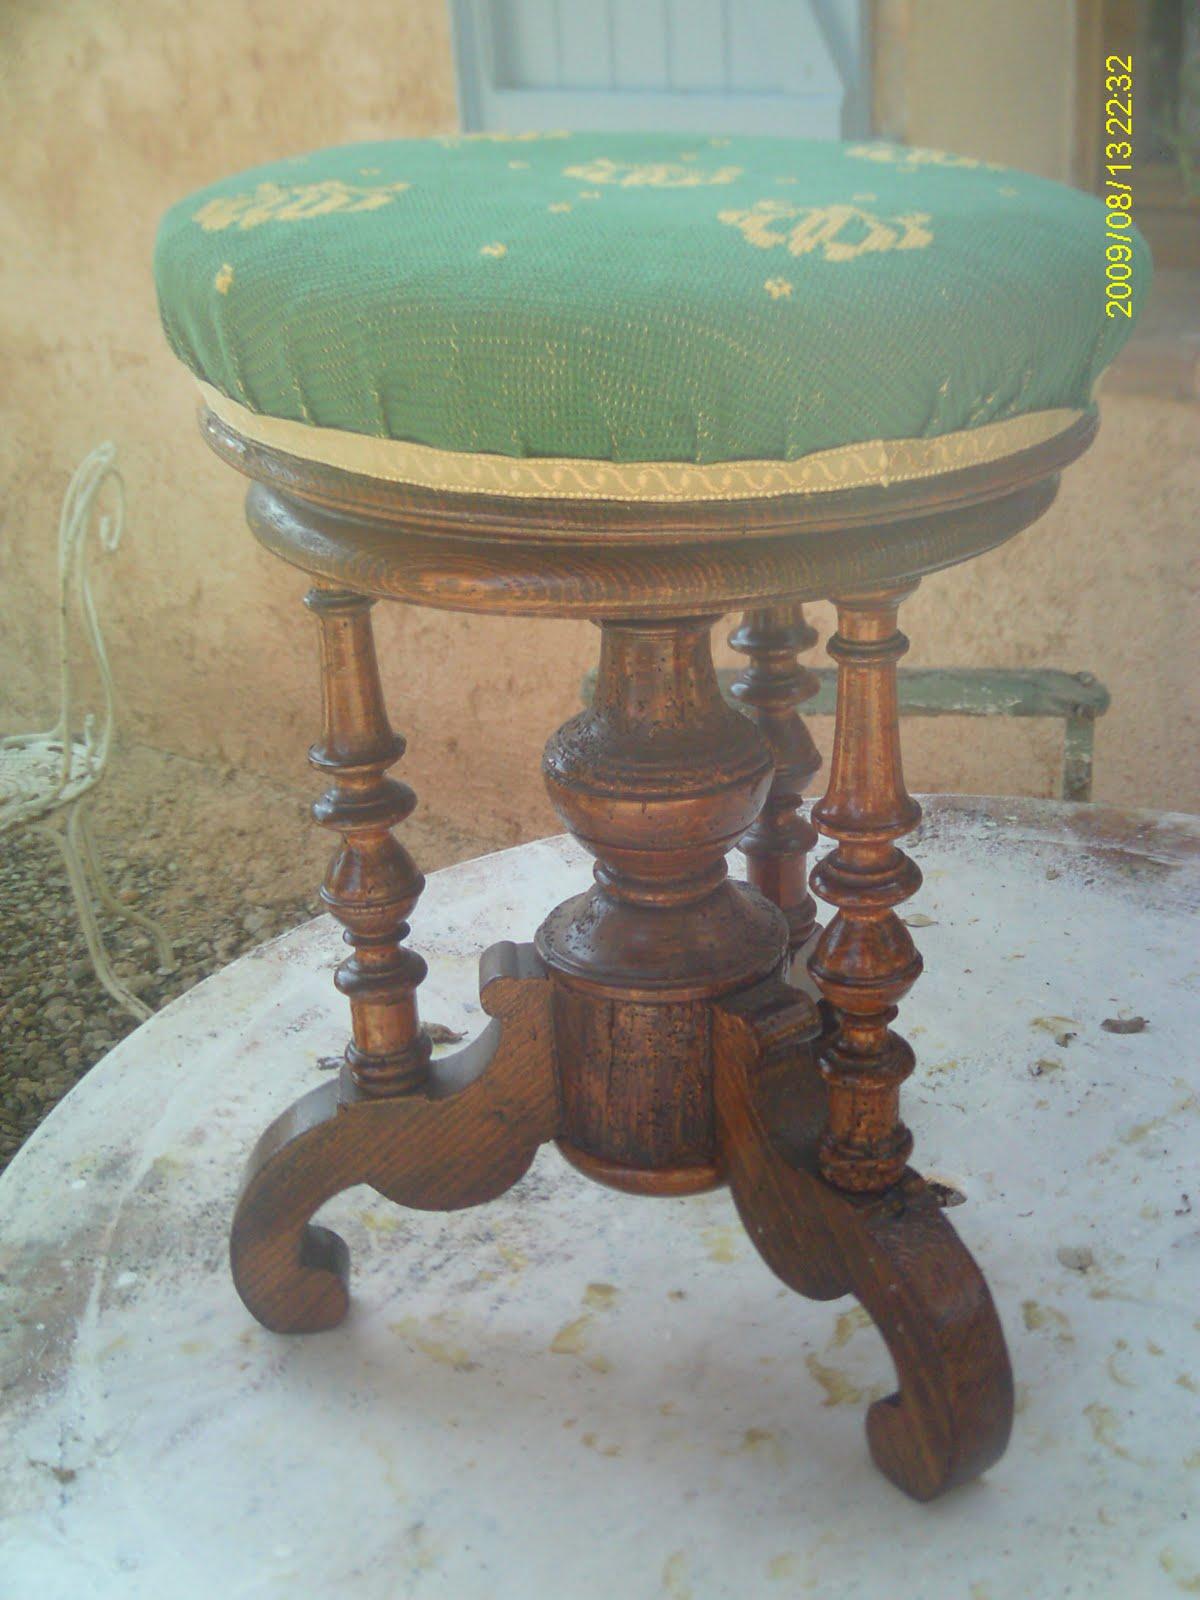 ancien tabouret de piano bois napol on iii empire restauration i. Black Bedroom Furniture Sets. Home Design Ideas